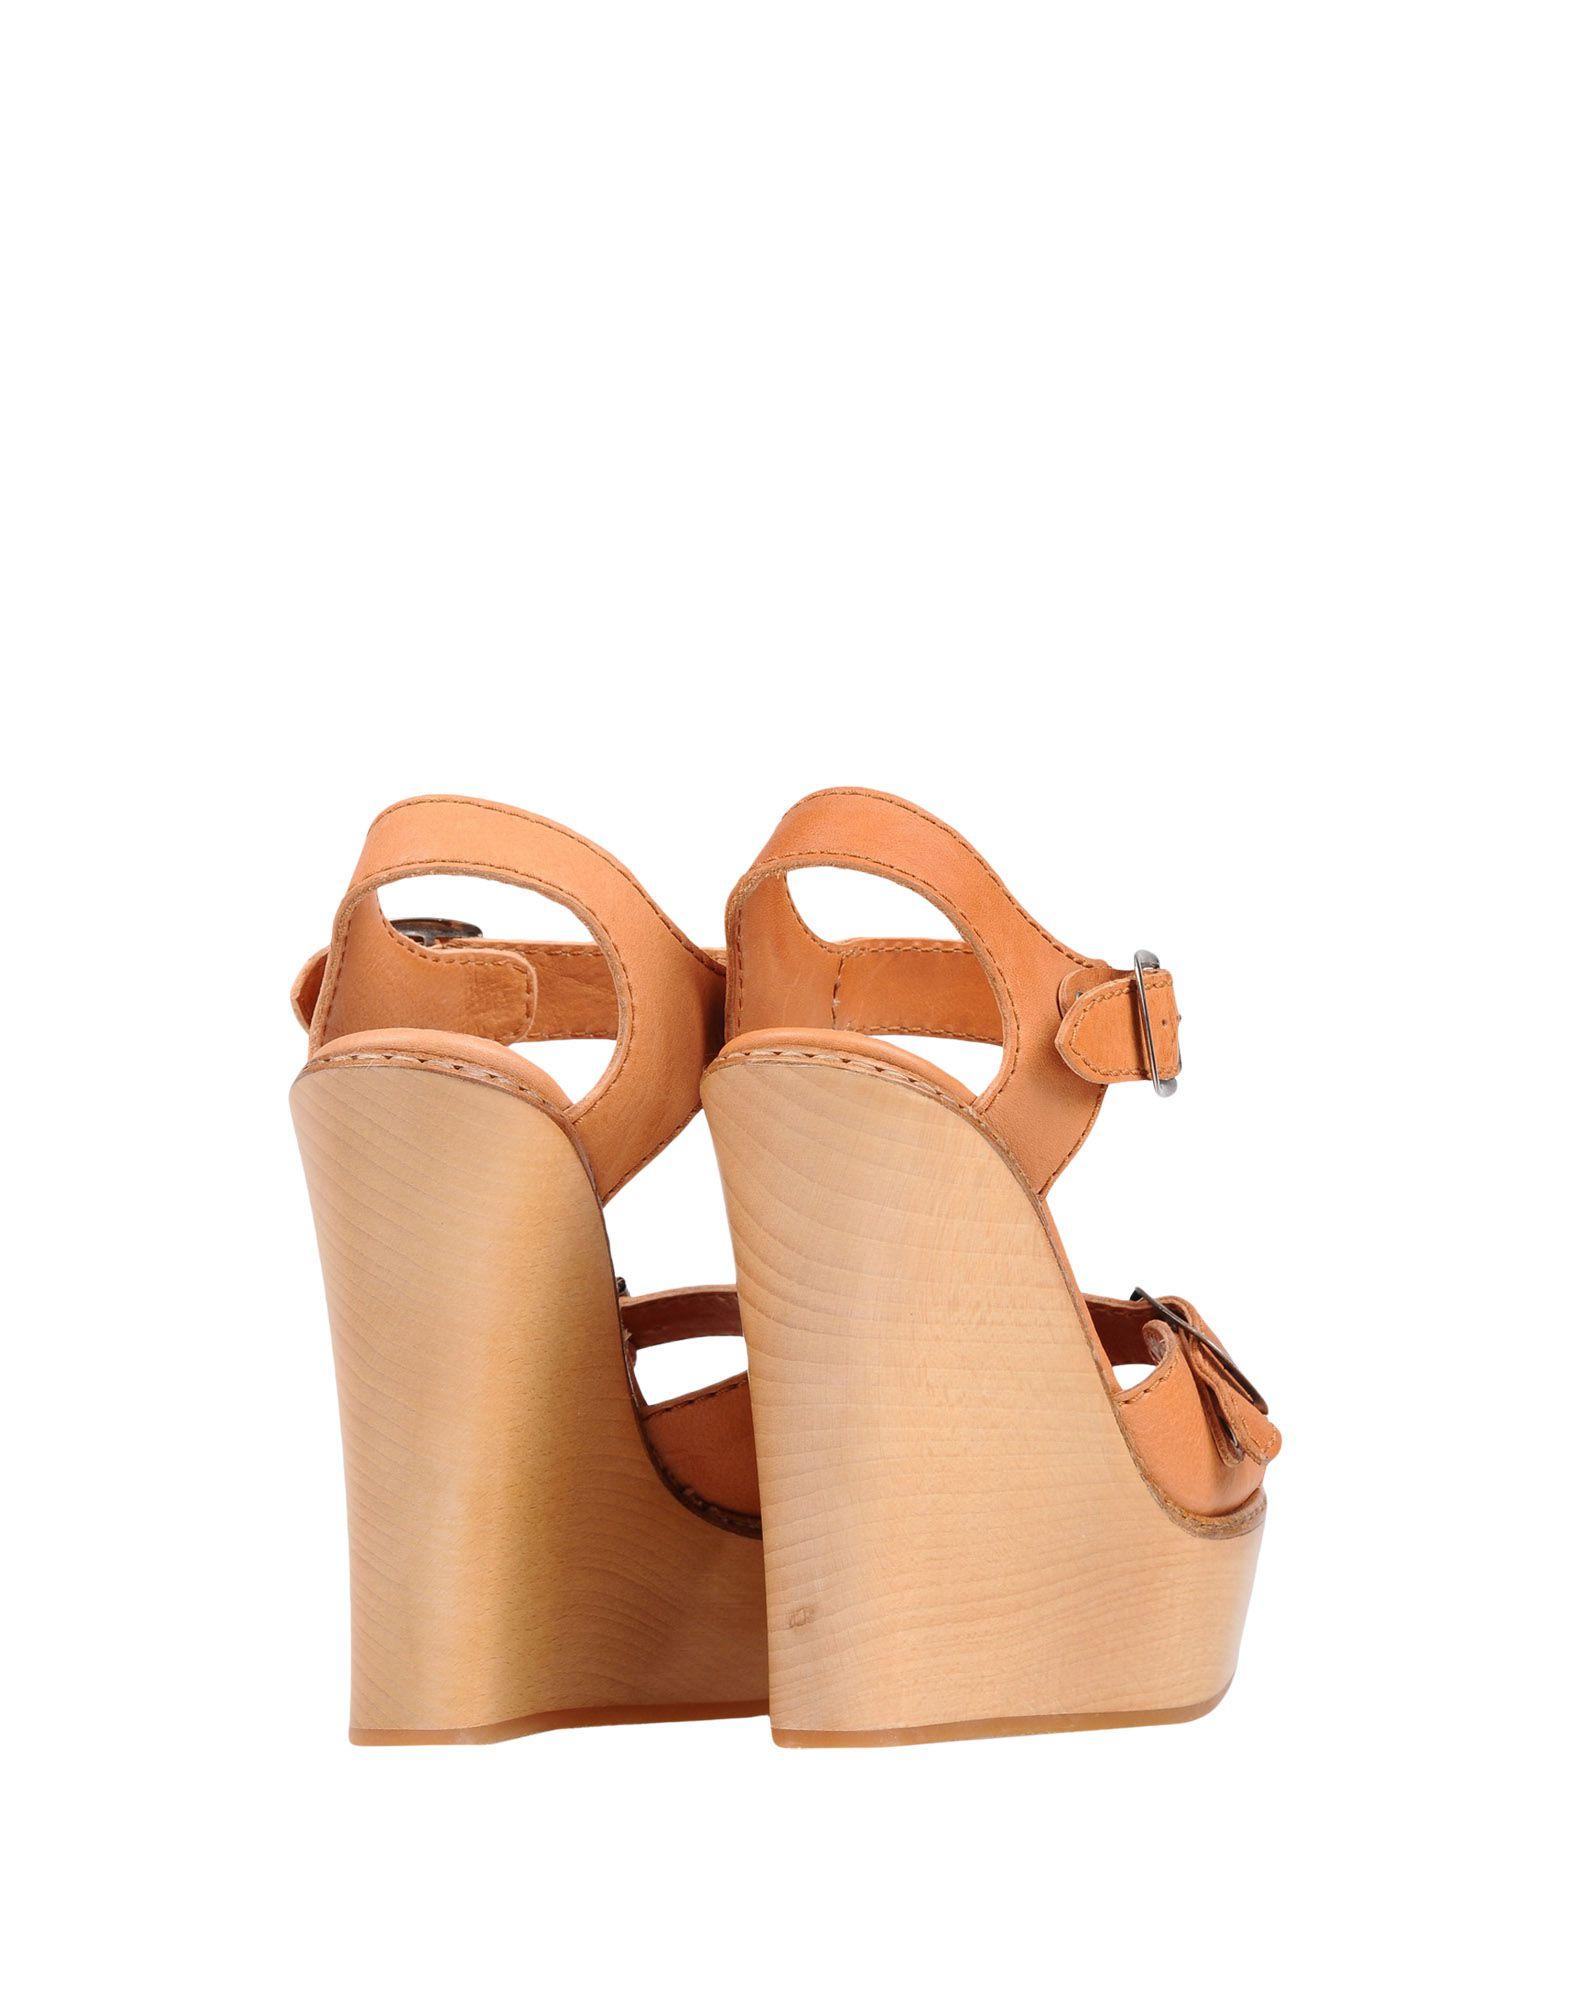 Chloé Sandalen aussehende Damen  11216474BSGünstige gut aussehende Sandalen Schuhe 251148